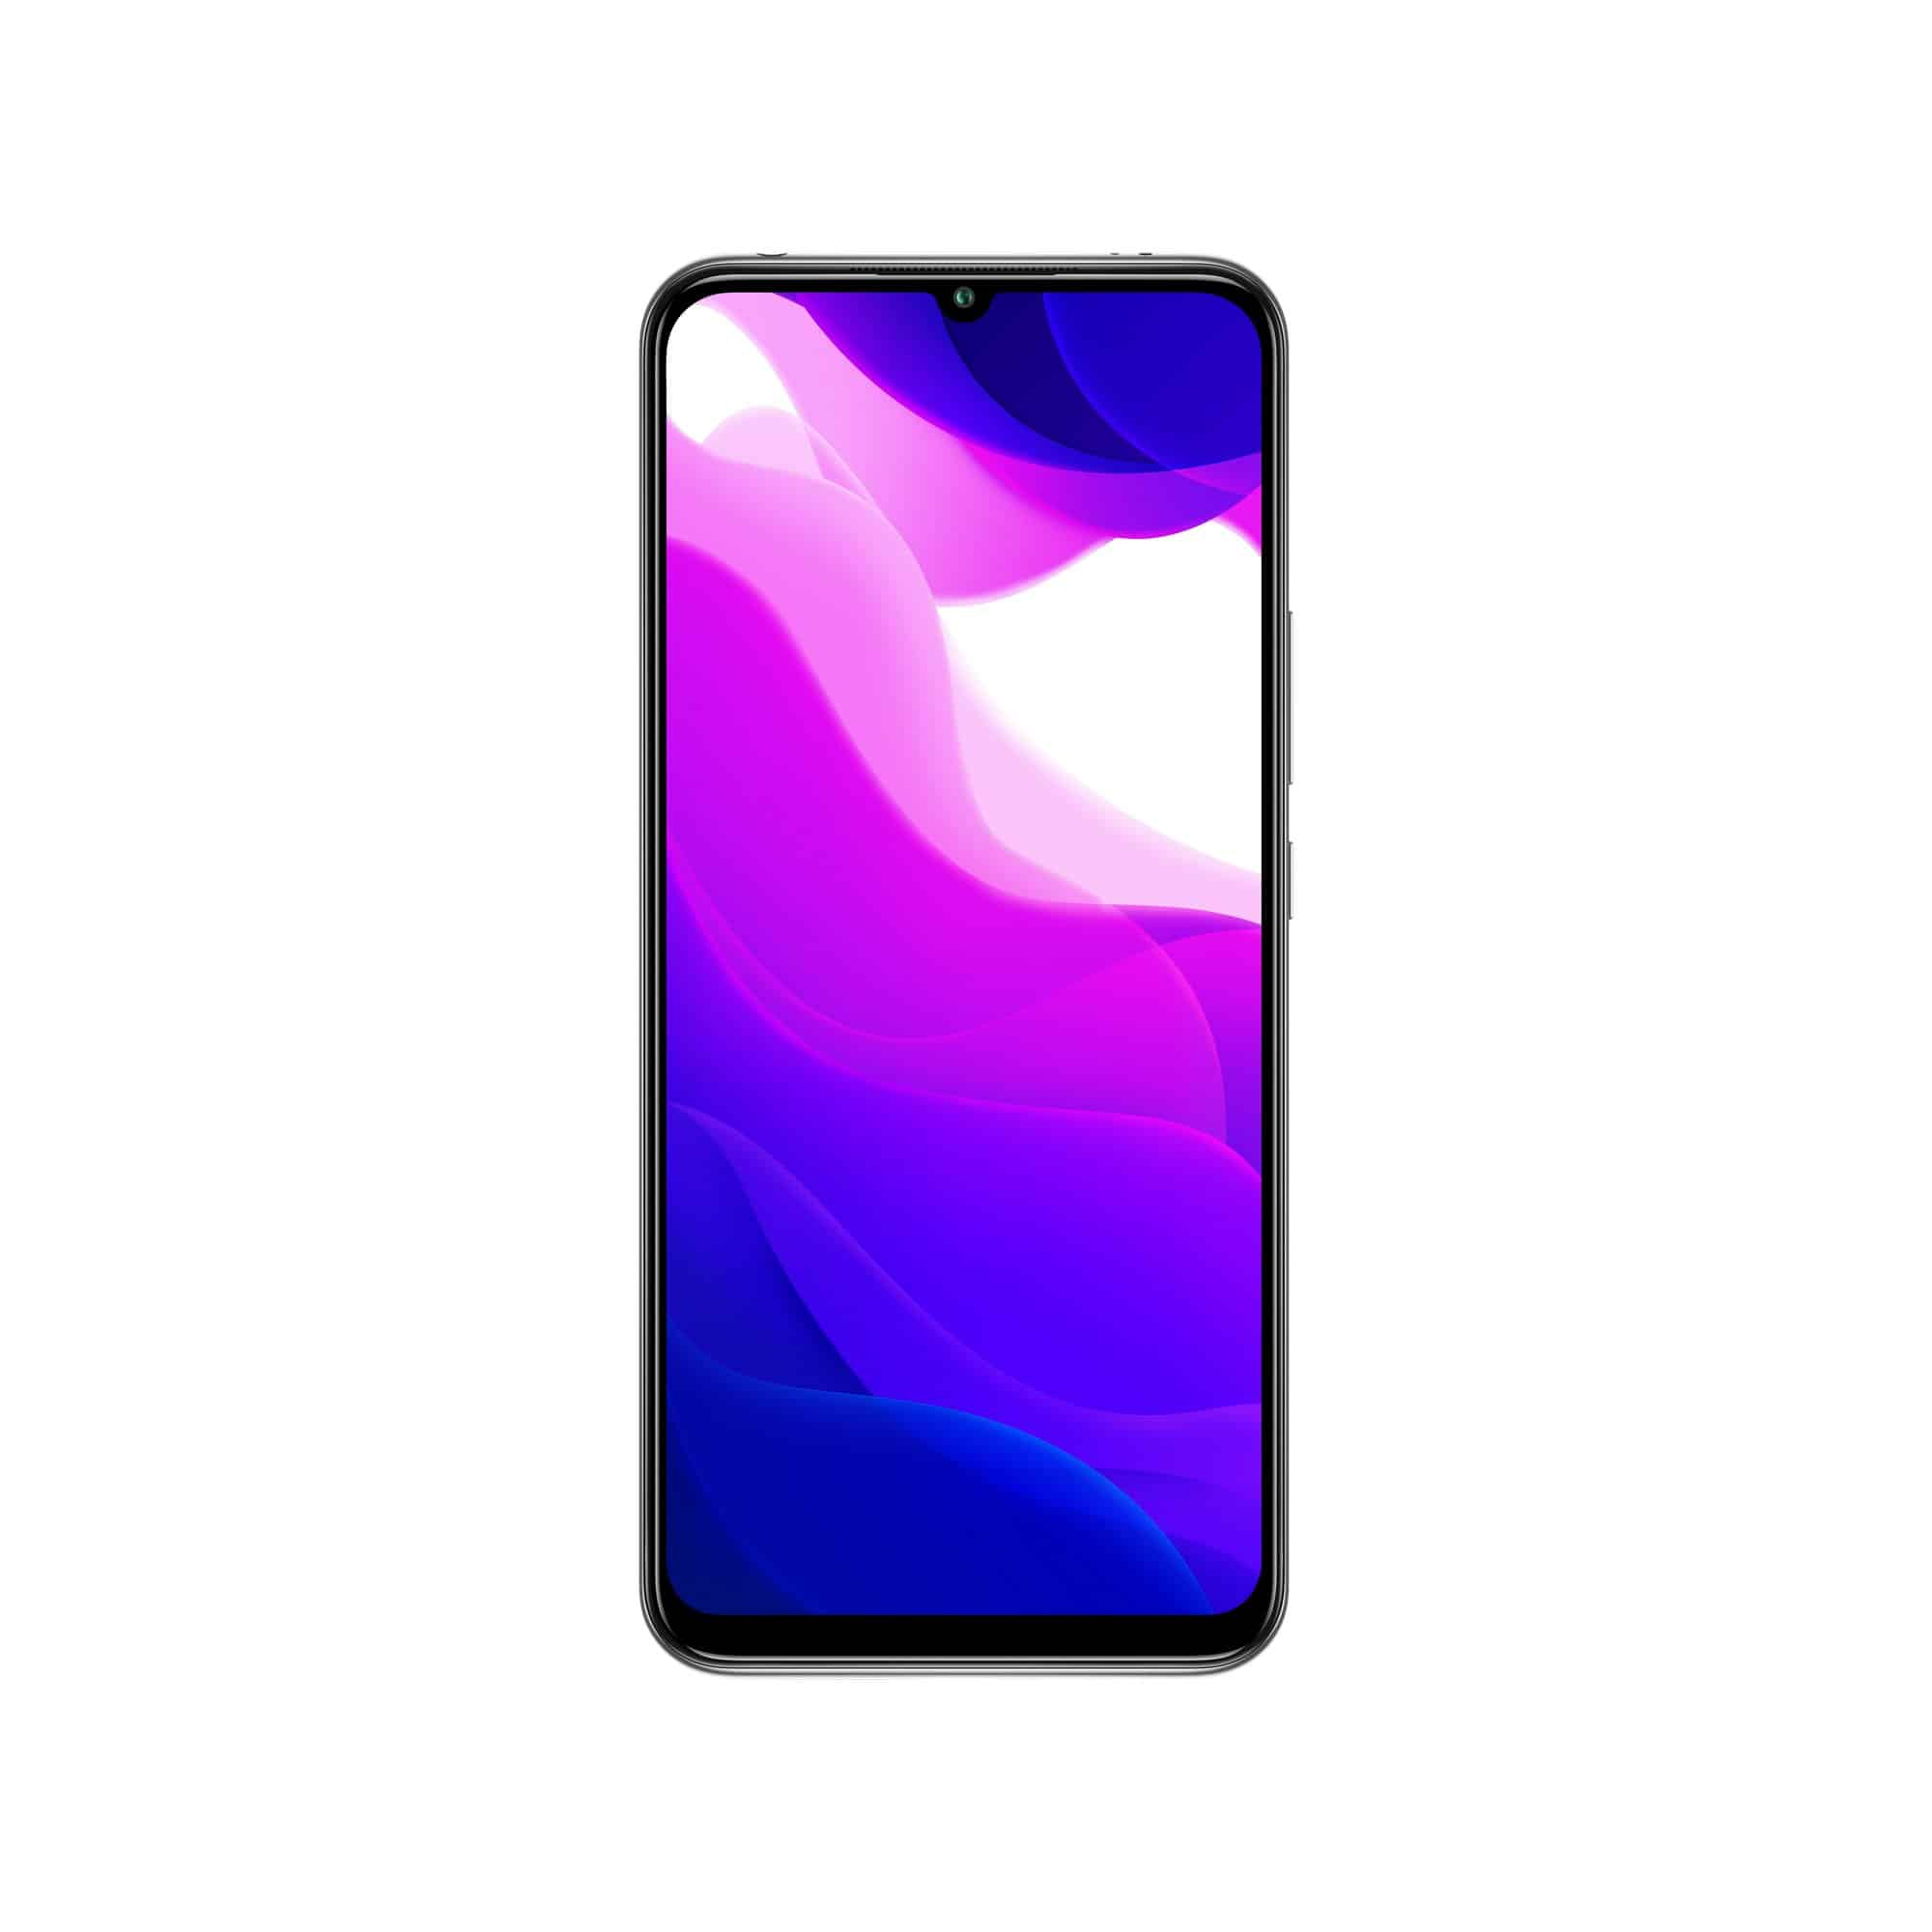 Xiaomi Mi 10 Lite image 4